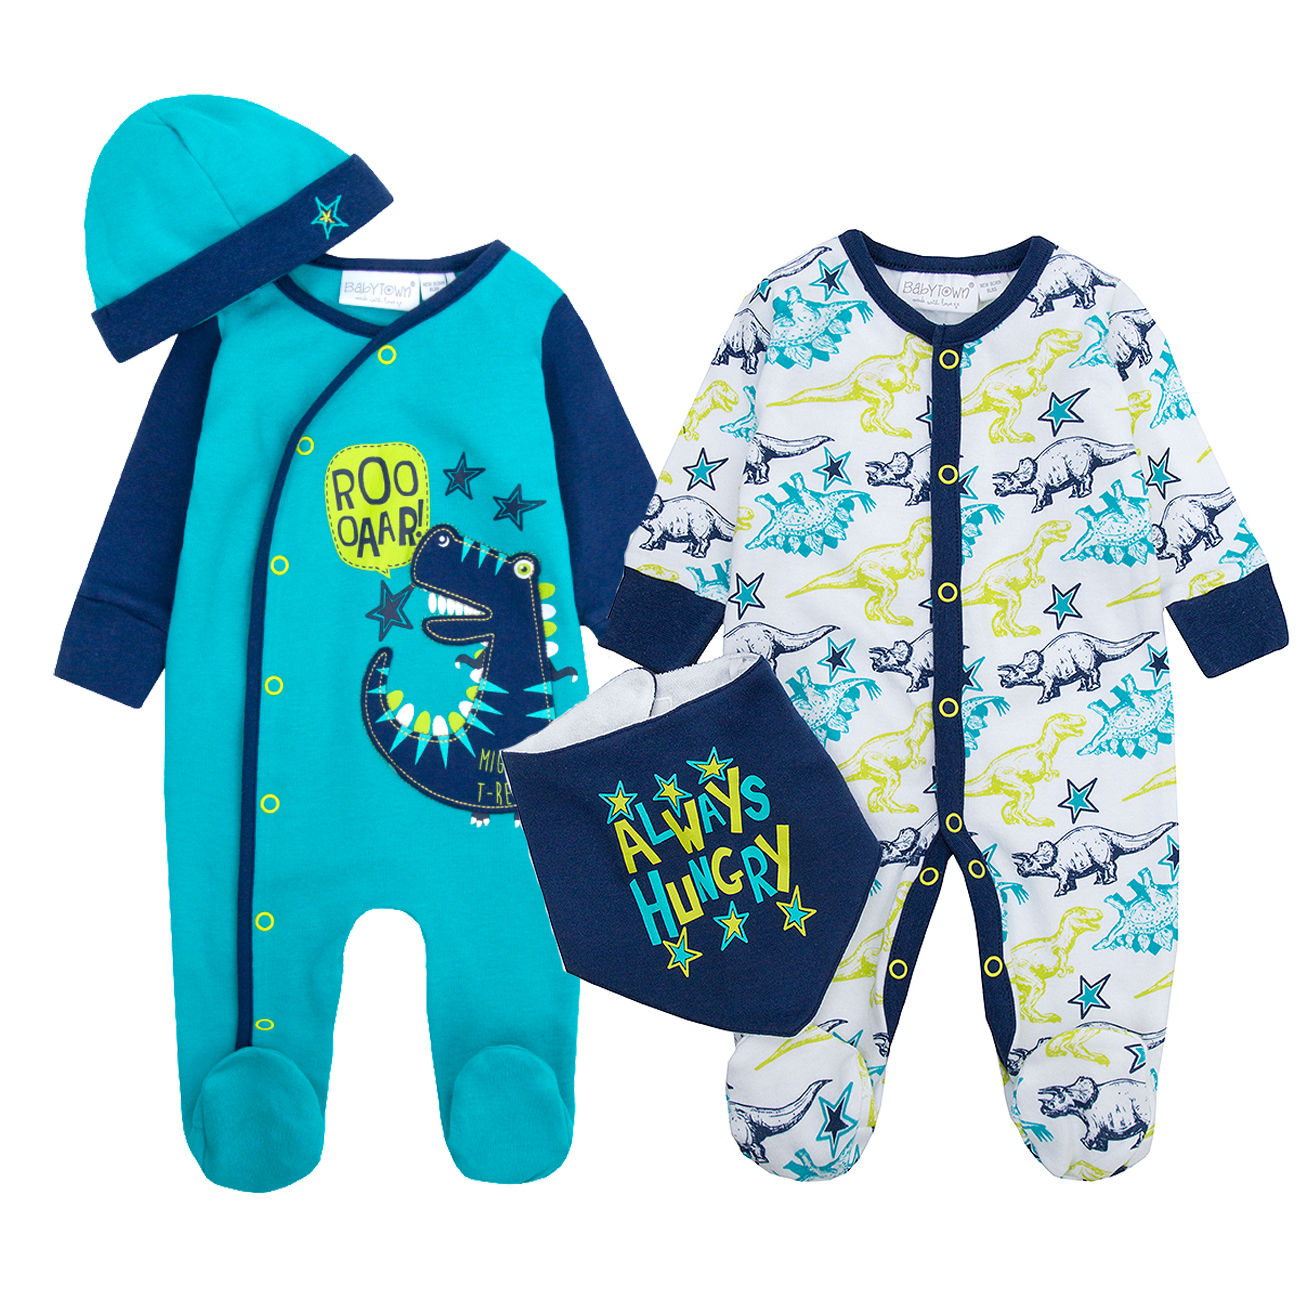 Newborn Baby Boys Sleepsuit Set Hat Car Print 2 Piece Babygrow Romper BABYTOWN